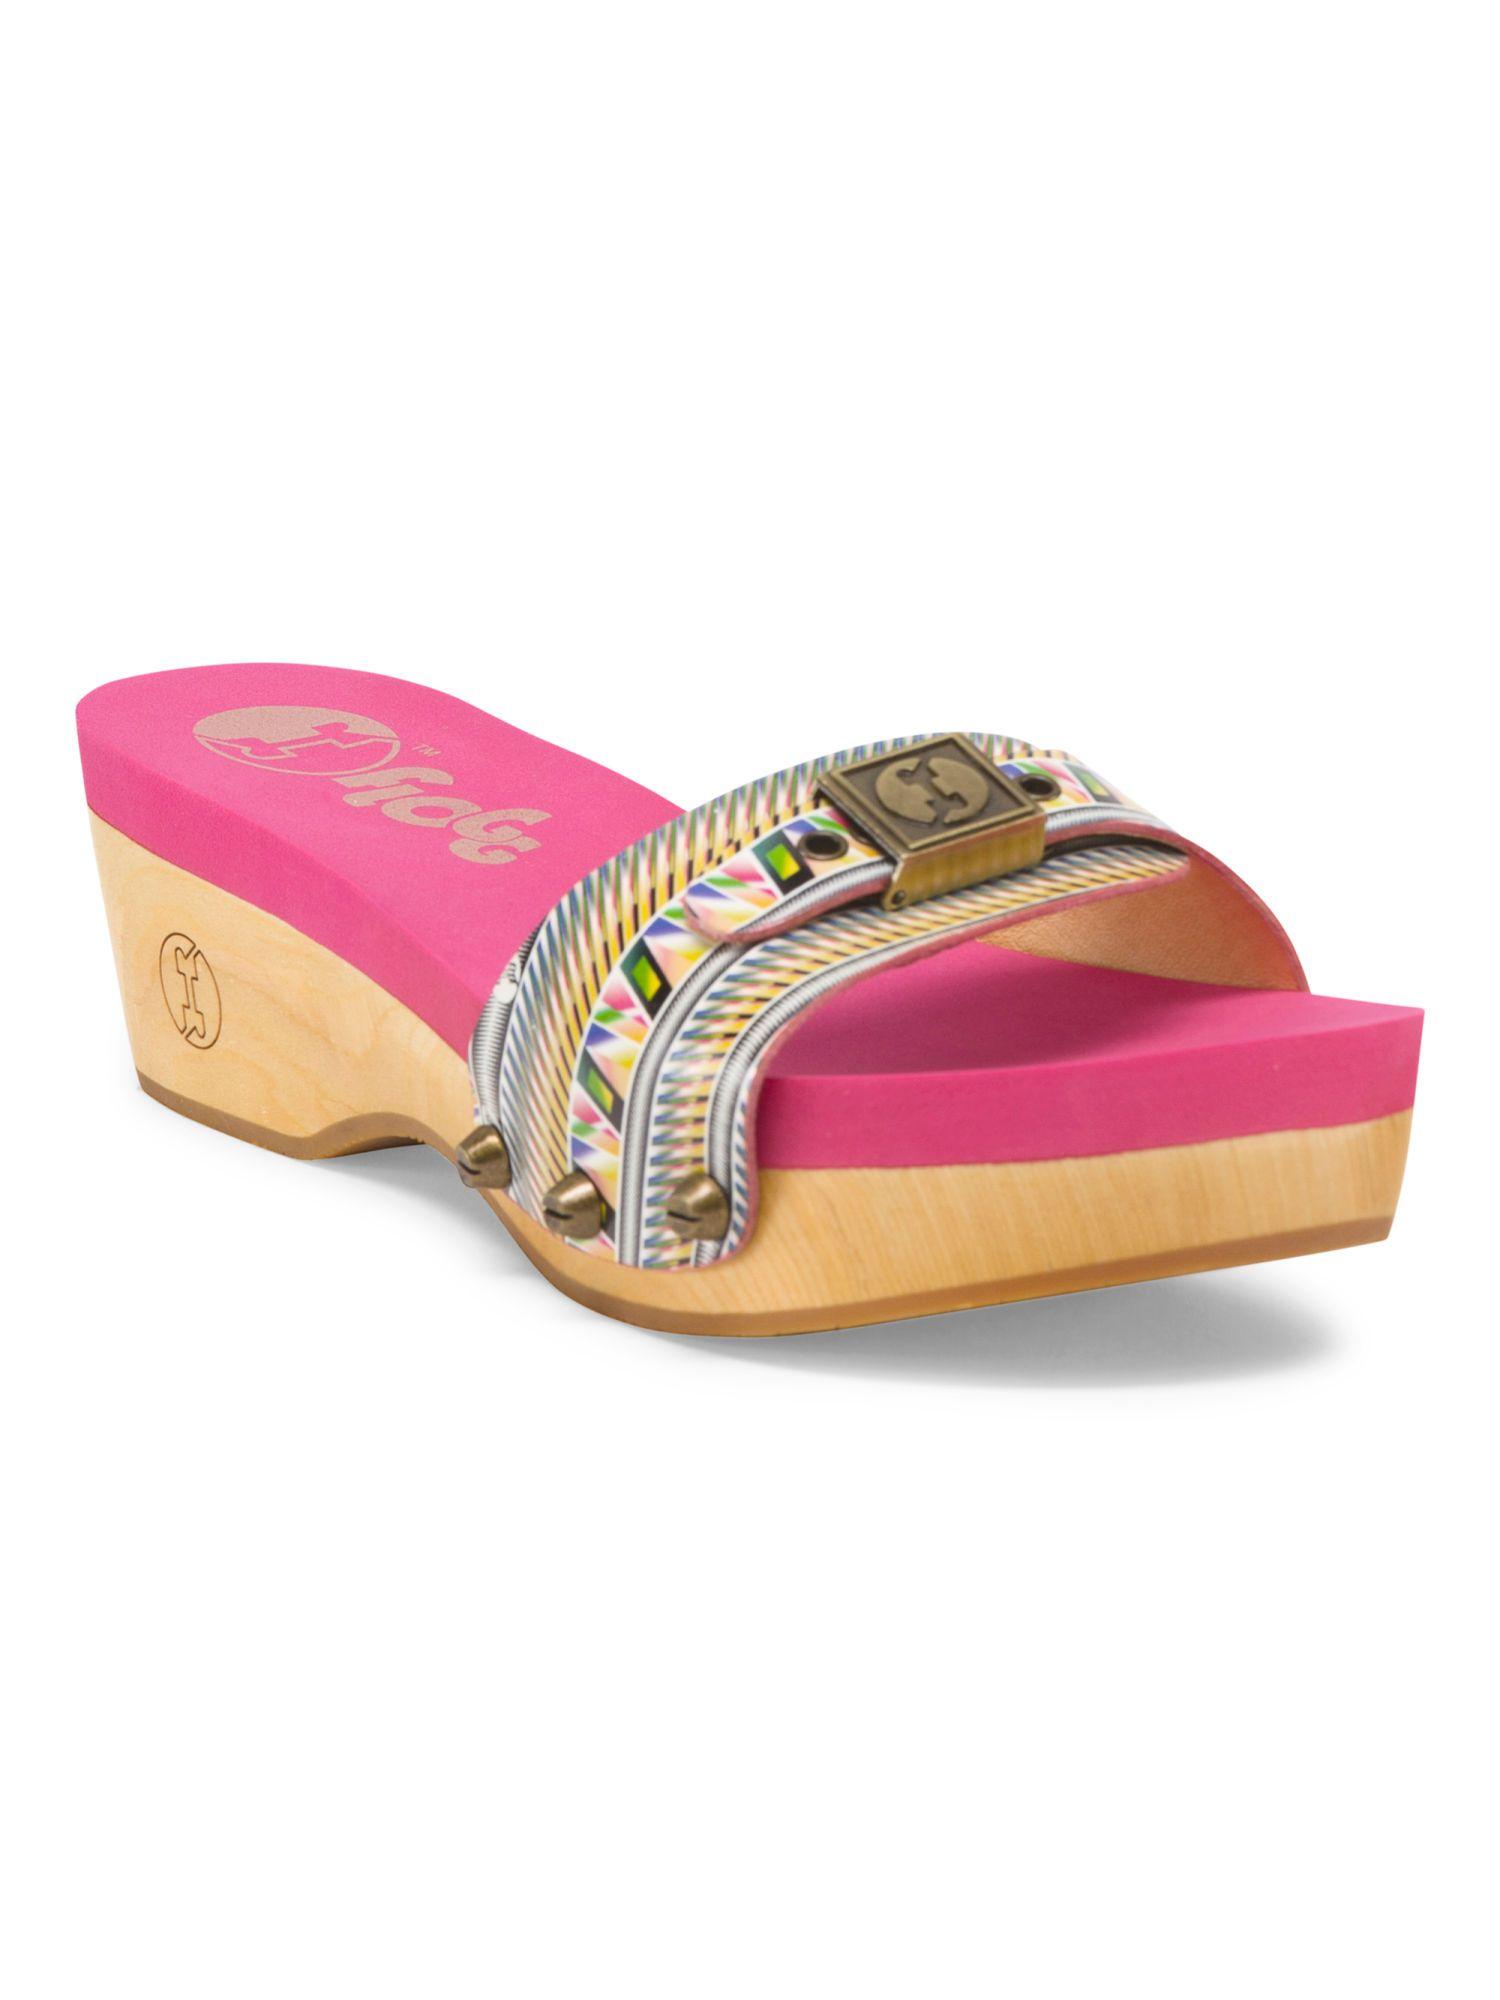 Leather slide on sandal sandals tjmaxx leather